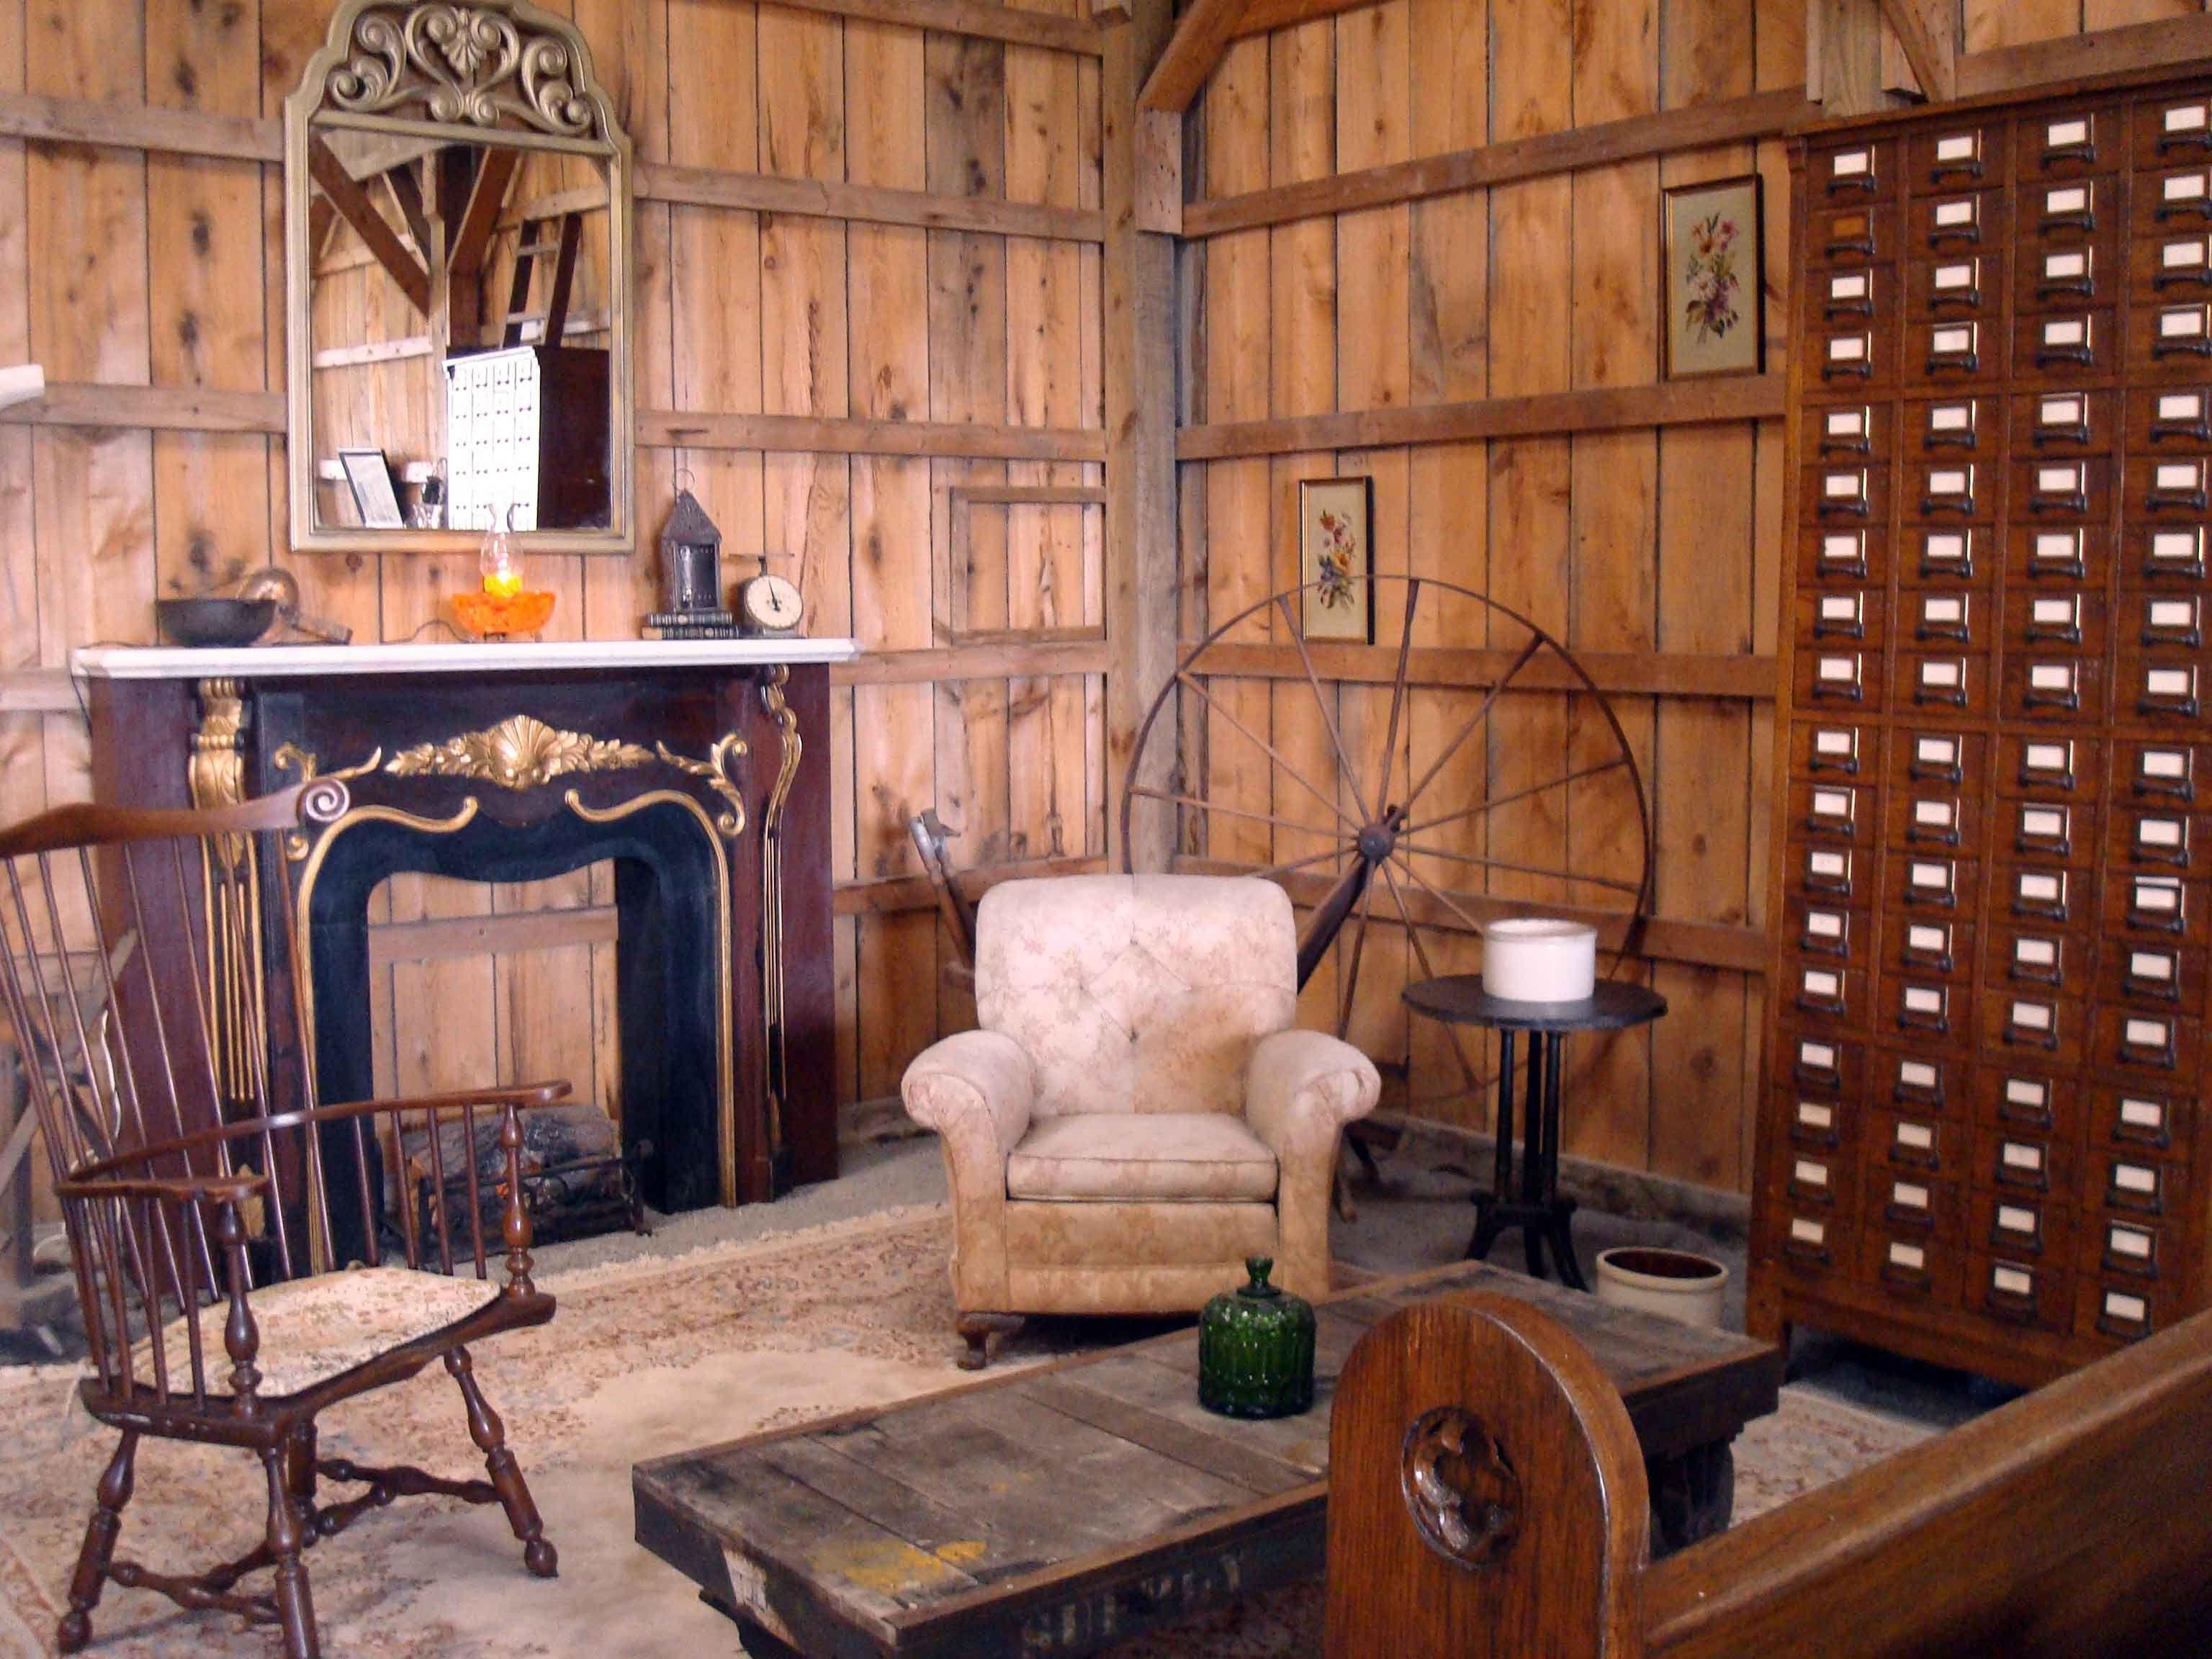 27 Admirable Western Decor Living Room Diy Ideas Rustic Living Room Rustic Home Interiors Living Decor